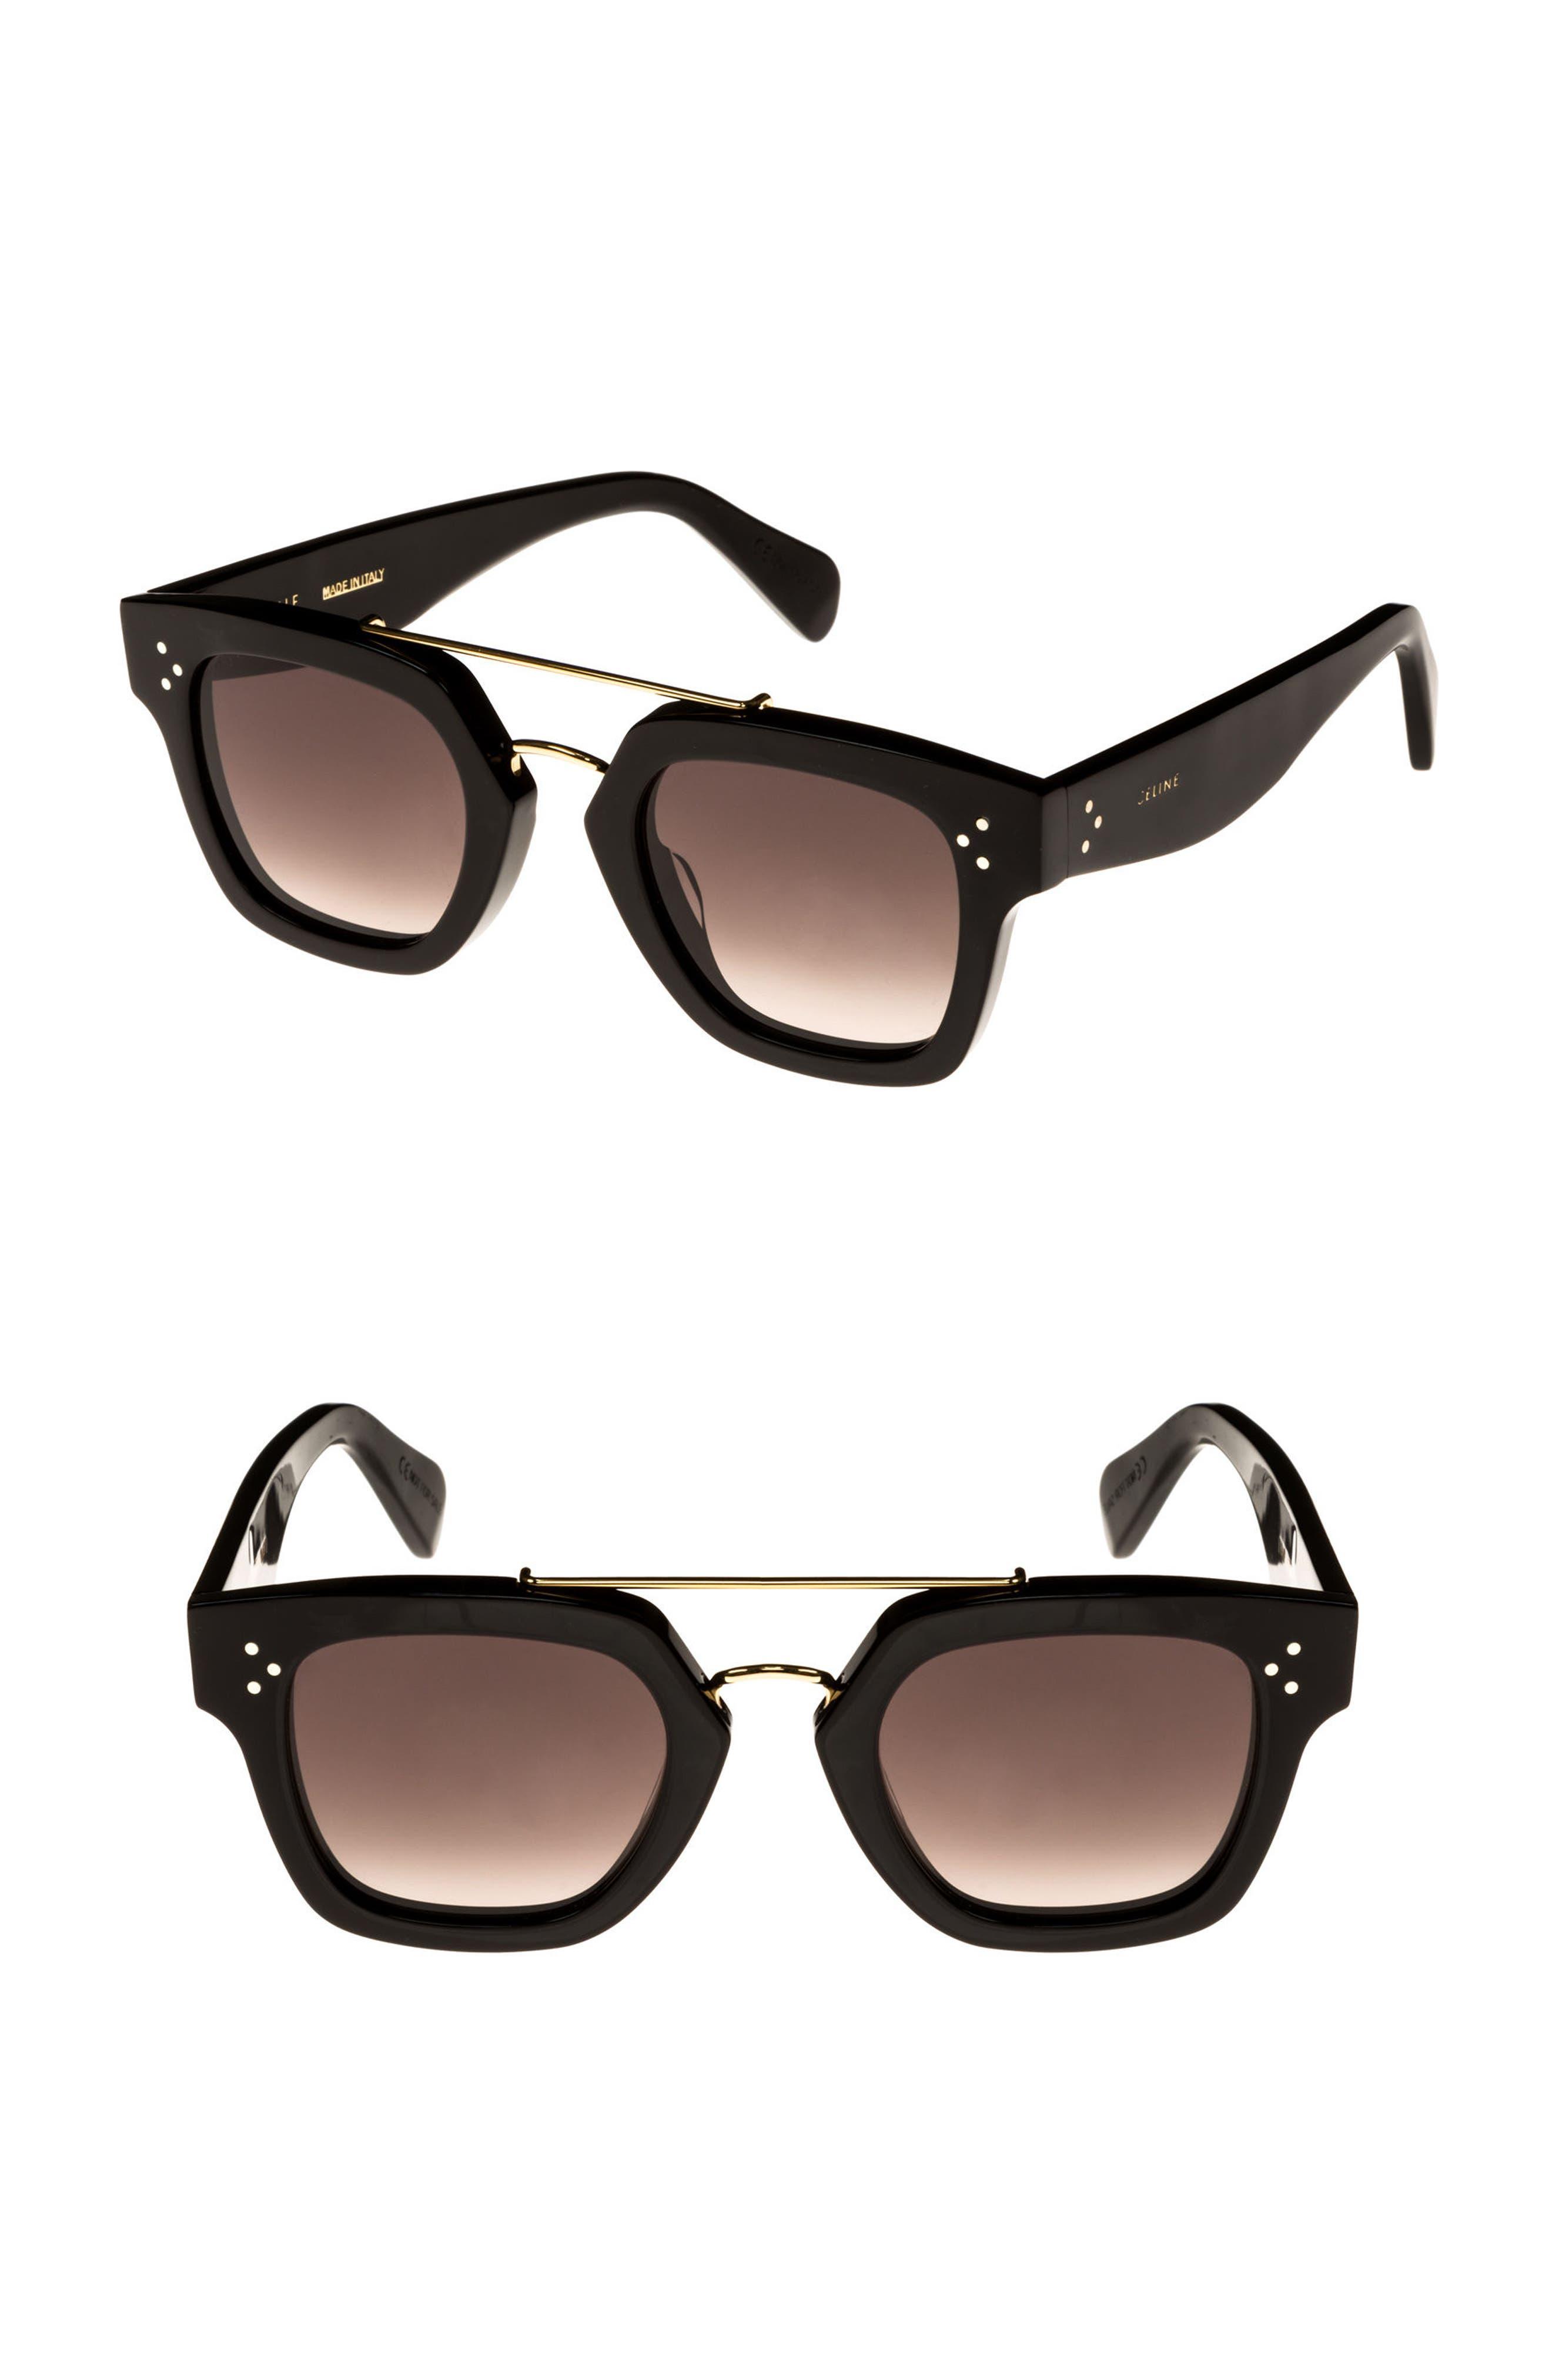 47mm Gradient Square Sunglasses,                         Main,                         color, 001